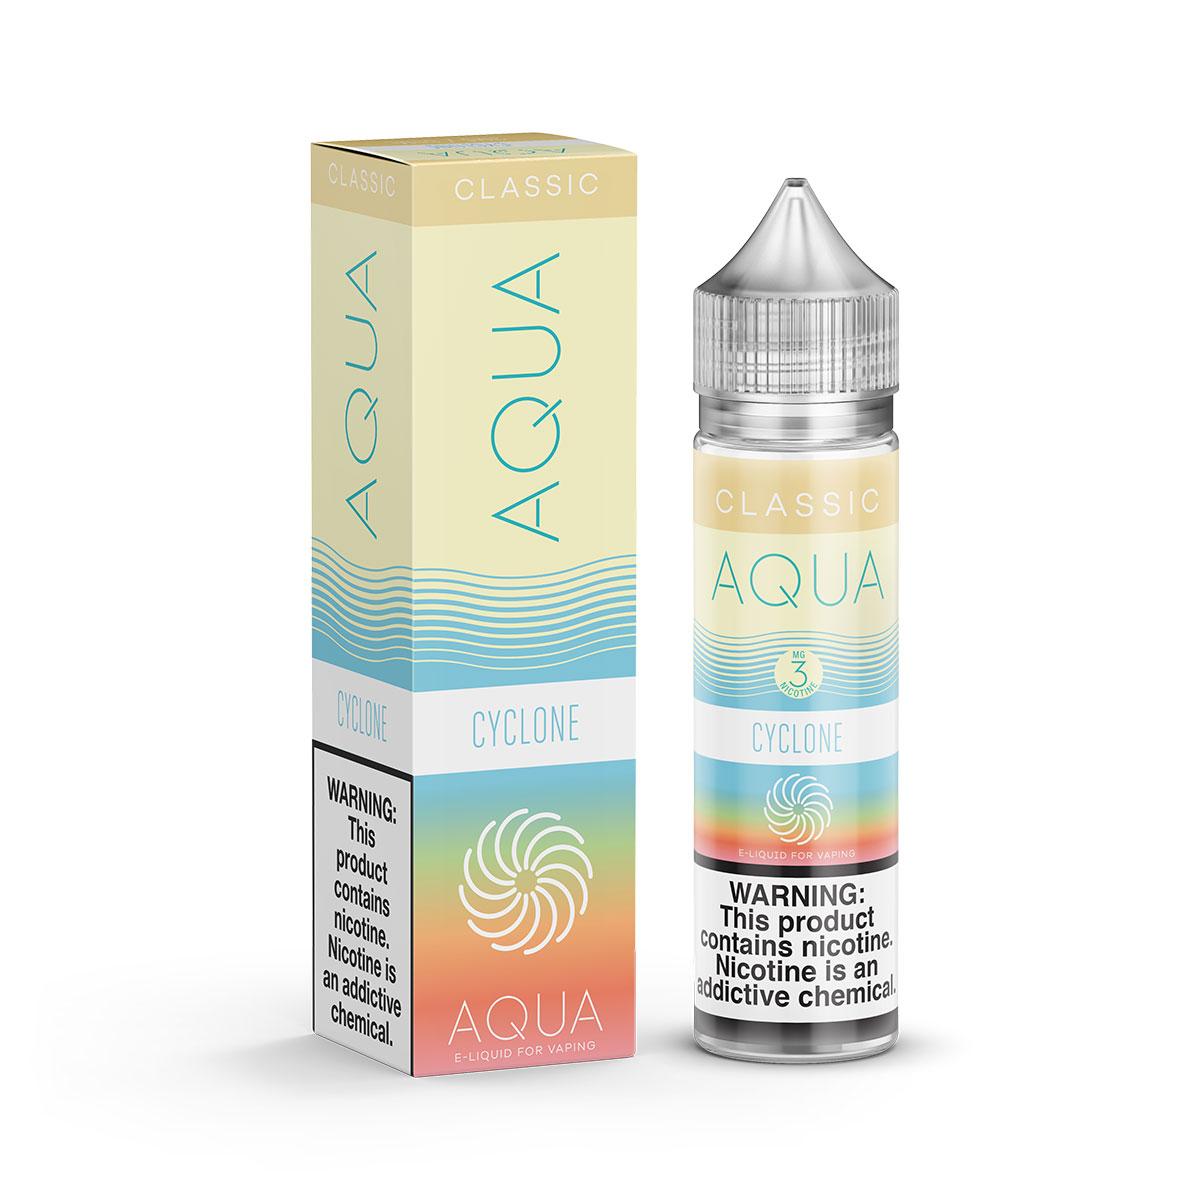 Aqua-Classic-60ml-Cyclone-3mg.jpg